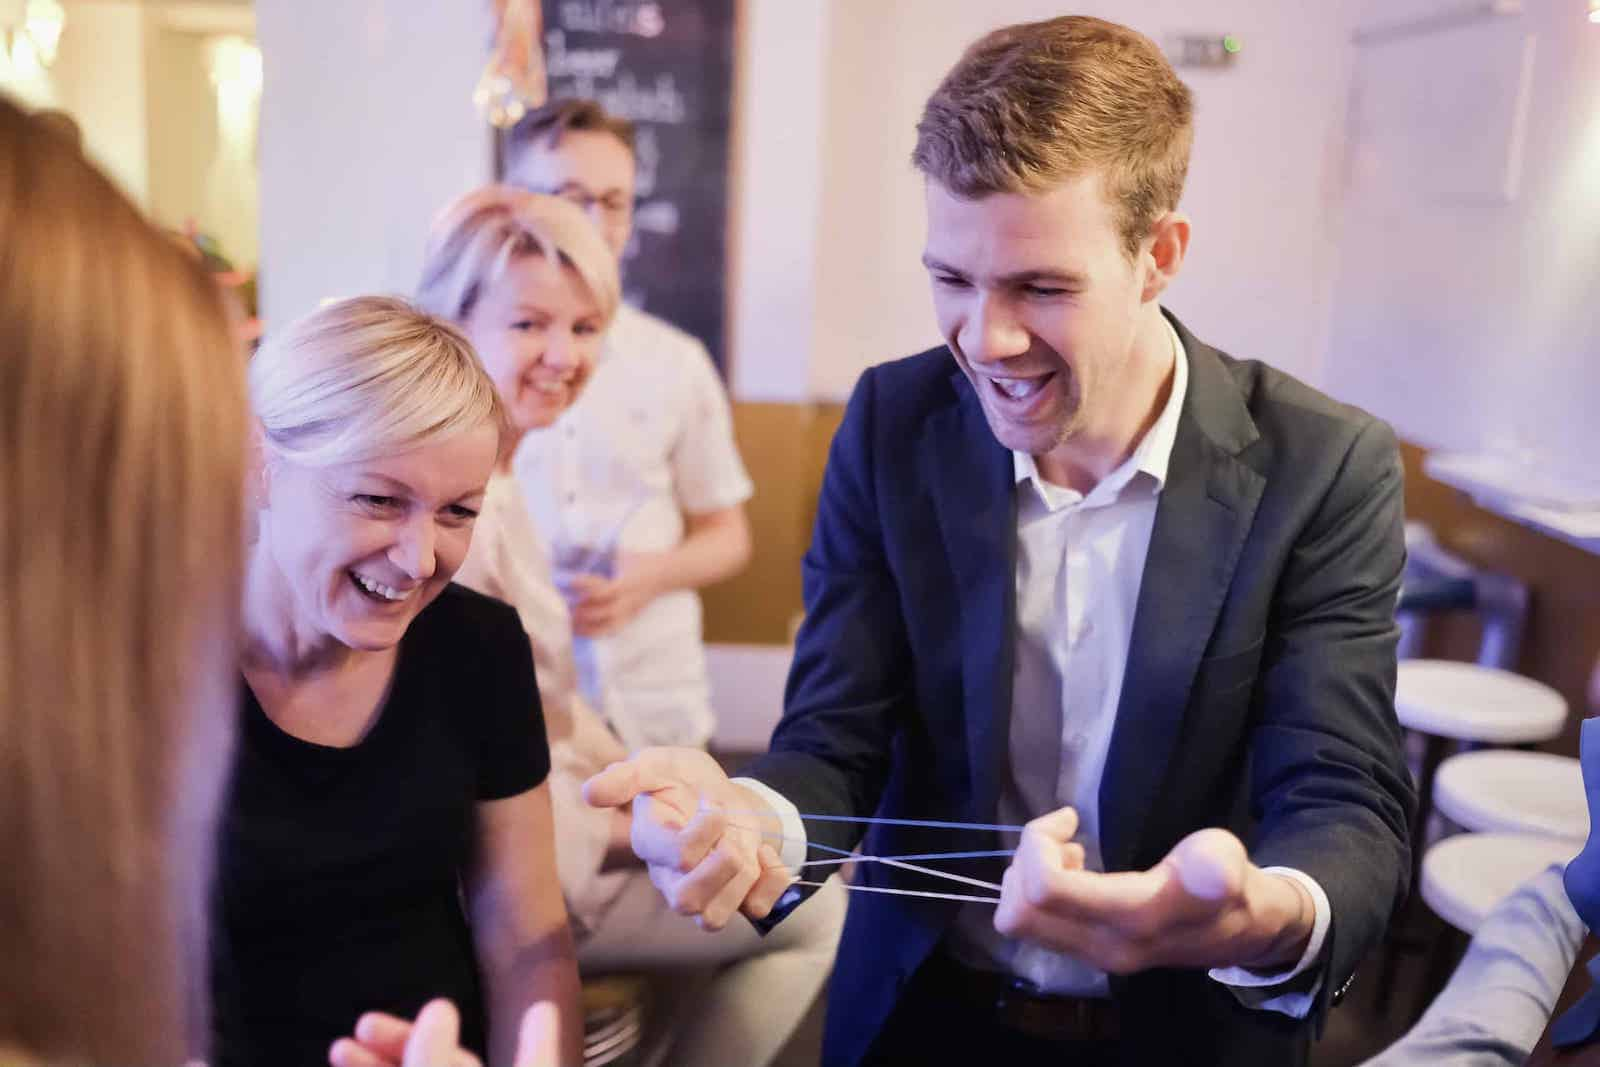 Zauberer Duisburg mit Publikum beim zaubern